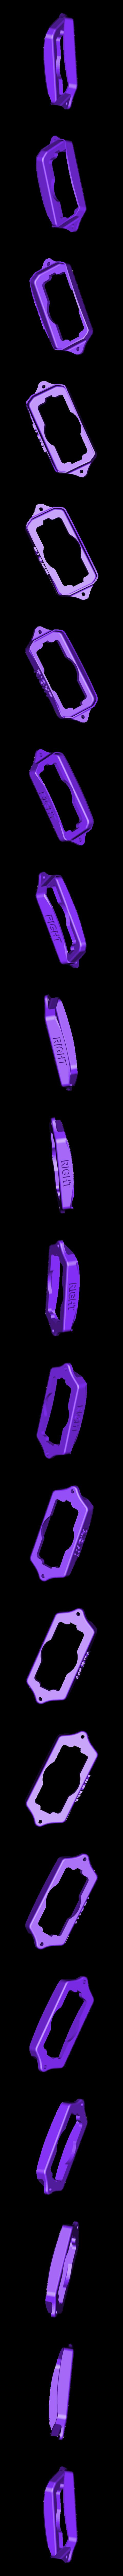 speaker_right.STL Download free STL file Poppy Torso • 3D printable model, PoppyProject